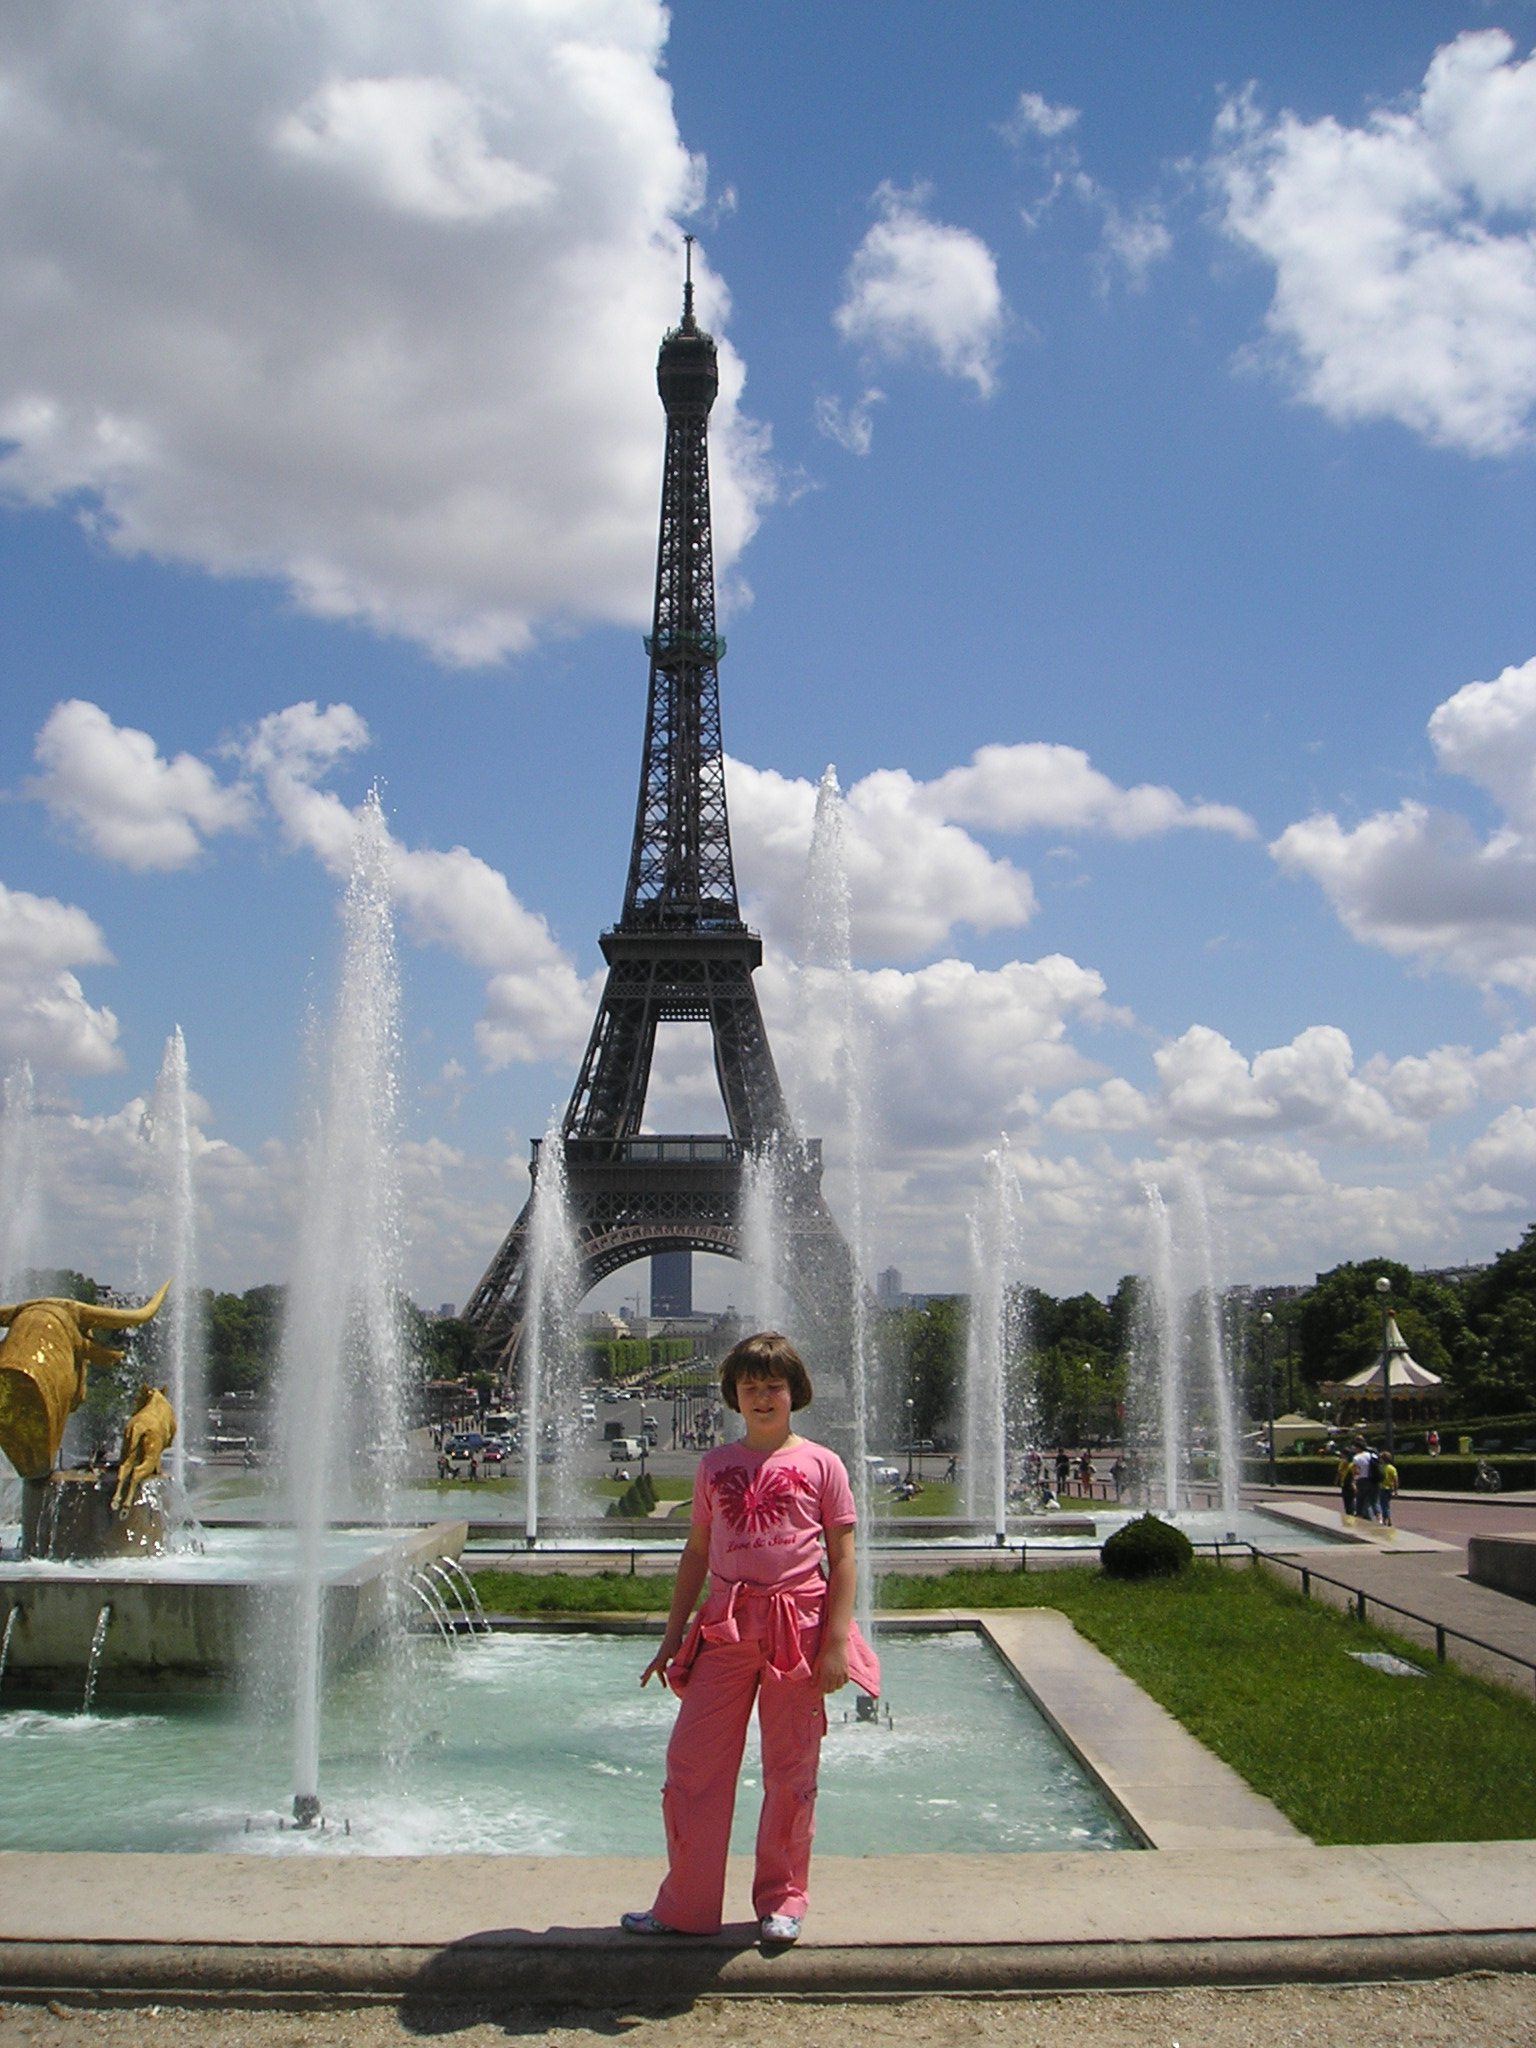 В париж и диснейленд в июне 2009 г